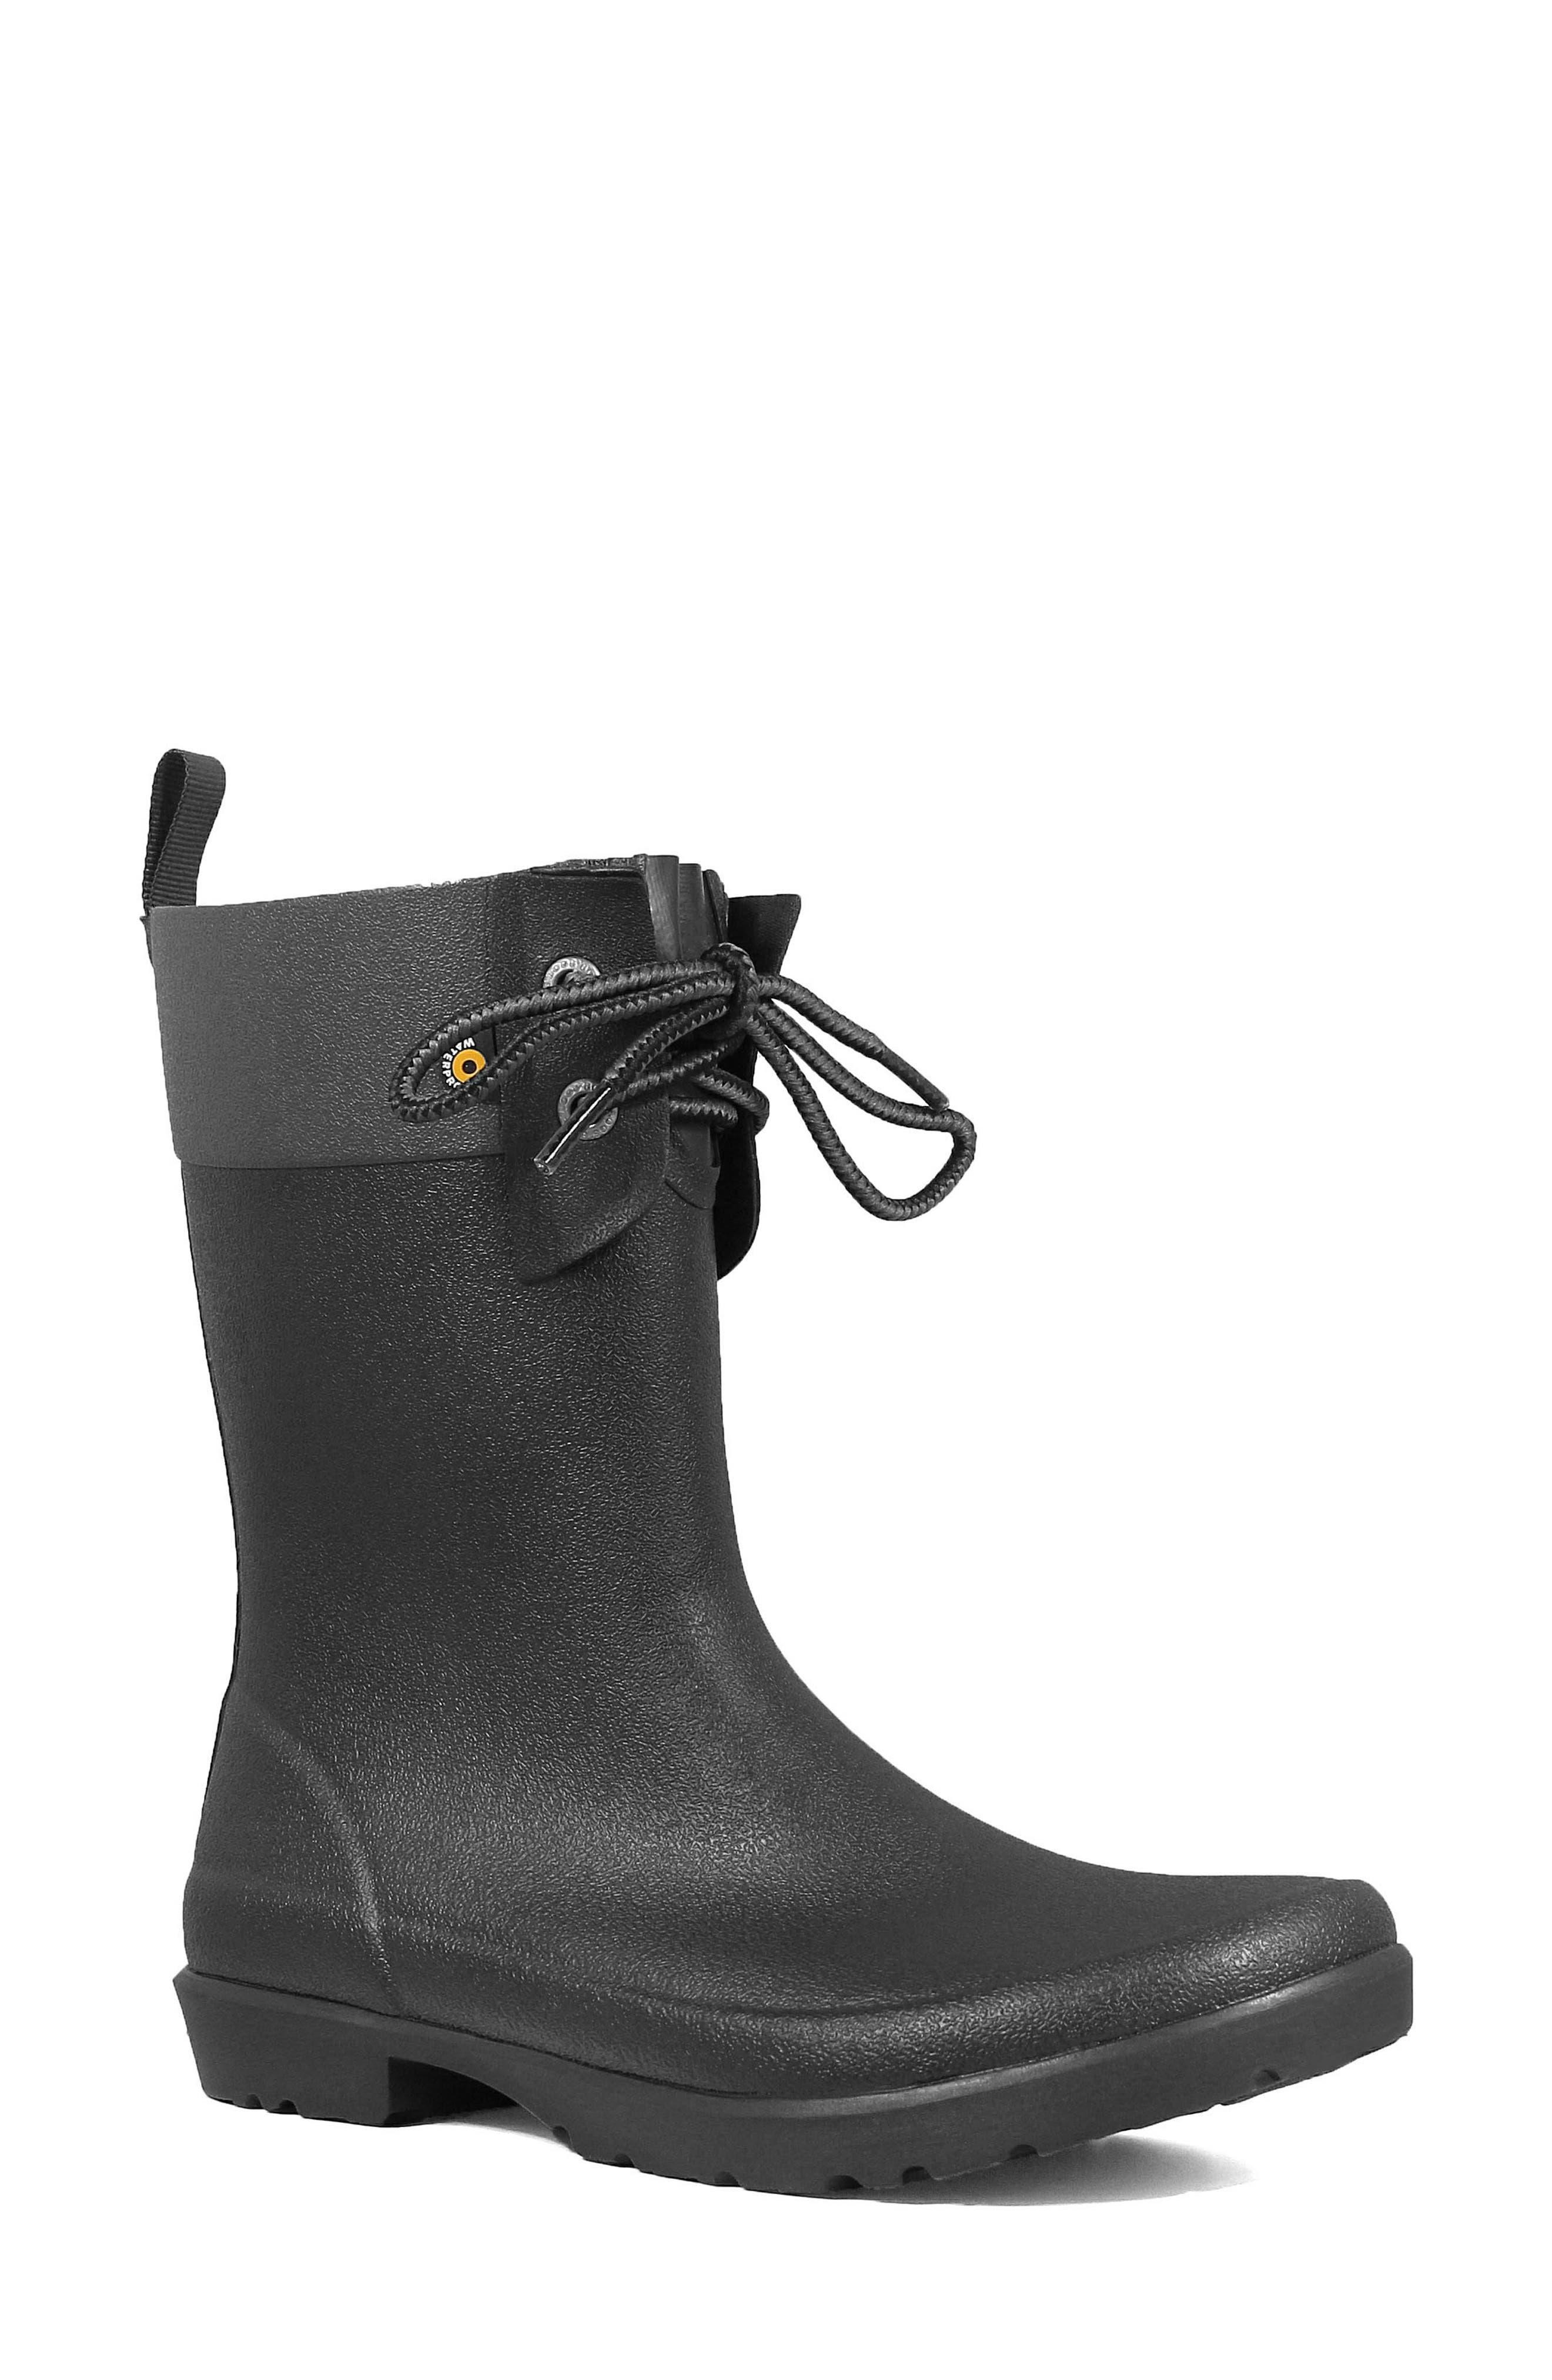 Bogs Floral Lace-Up Waterproof Rain Boot, Black